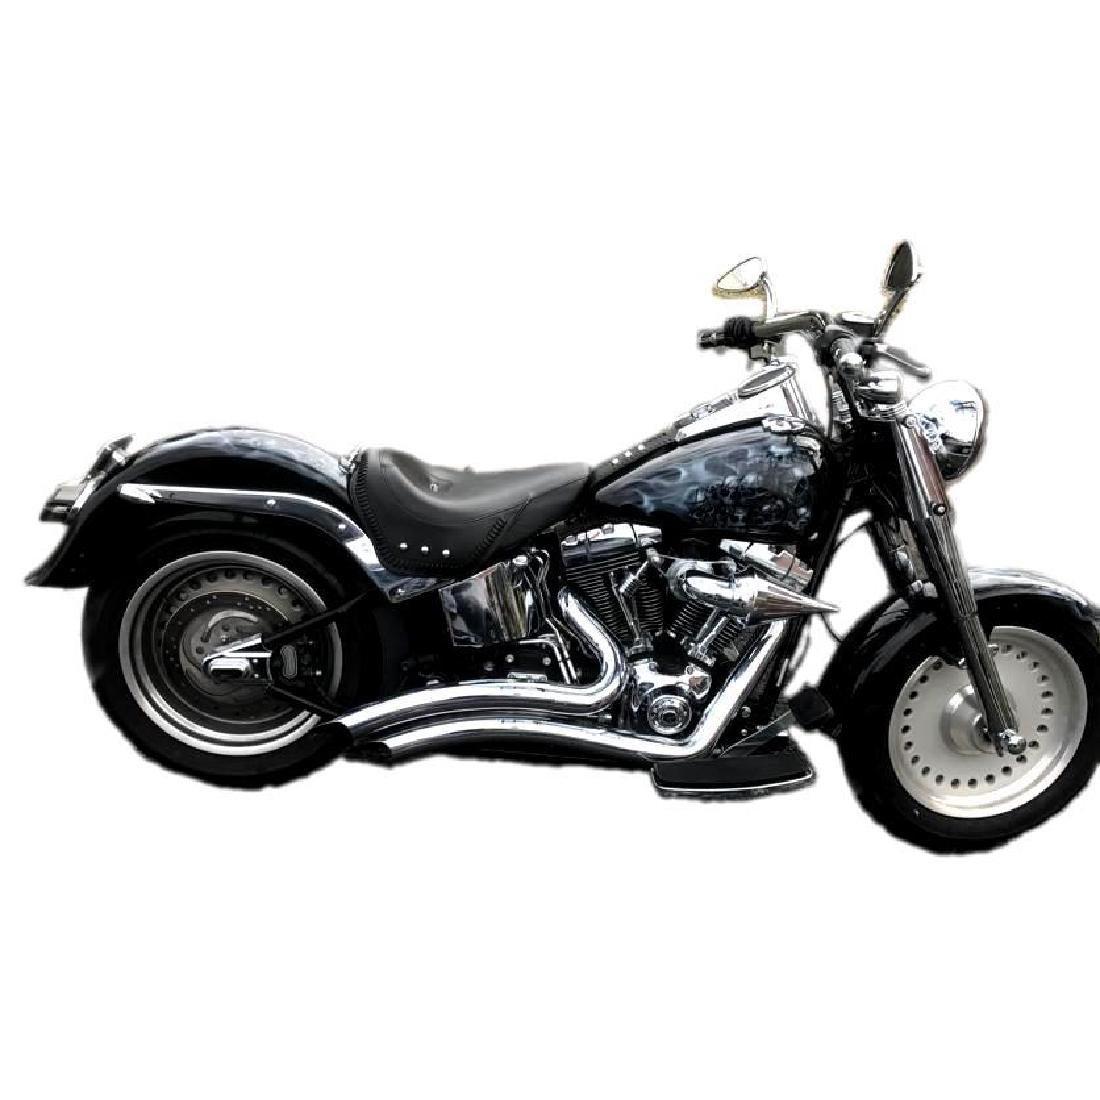 2007 Custom Harley-Davidson FLSTF Fatboy